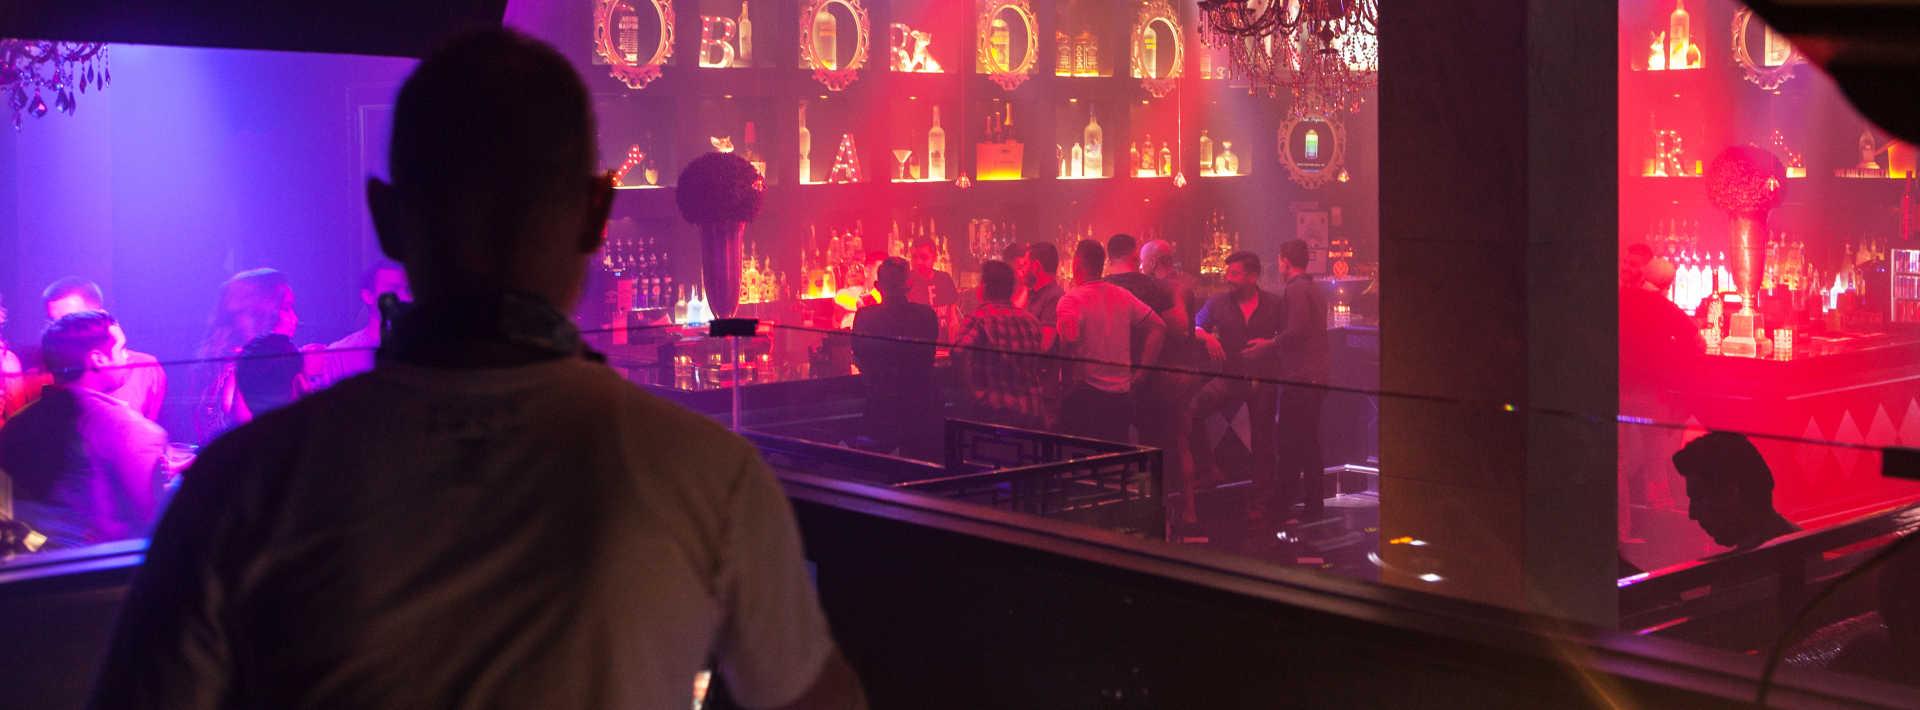 Houston LGBT Nightlife Bars Clubs Live Music